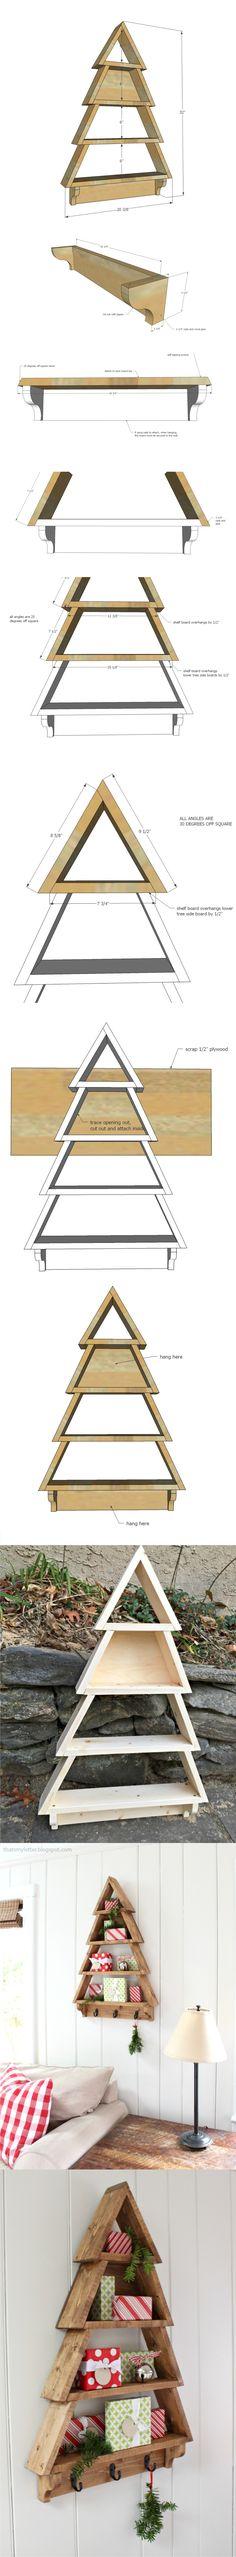 estanteria arbol navidad DIY muy ingenioso 2